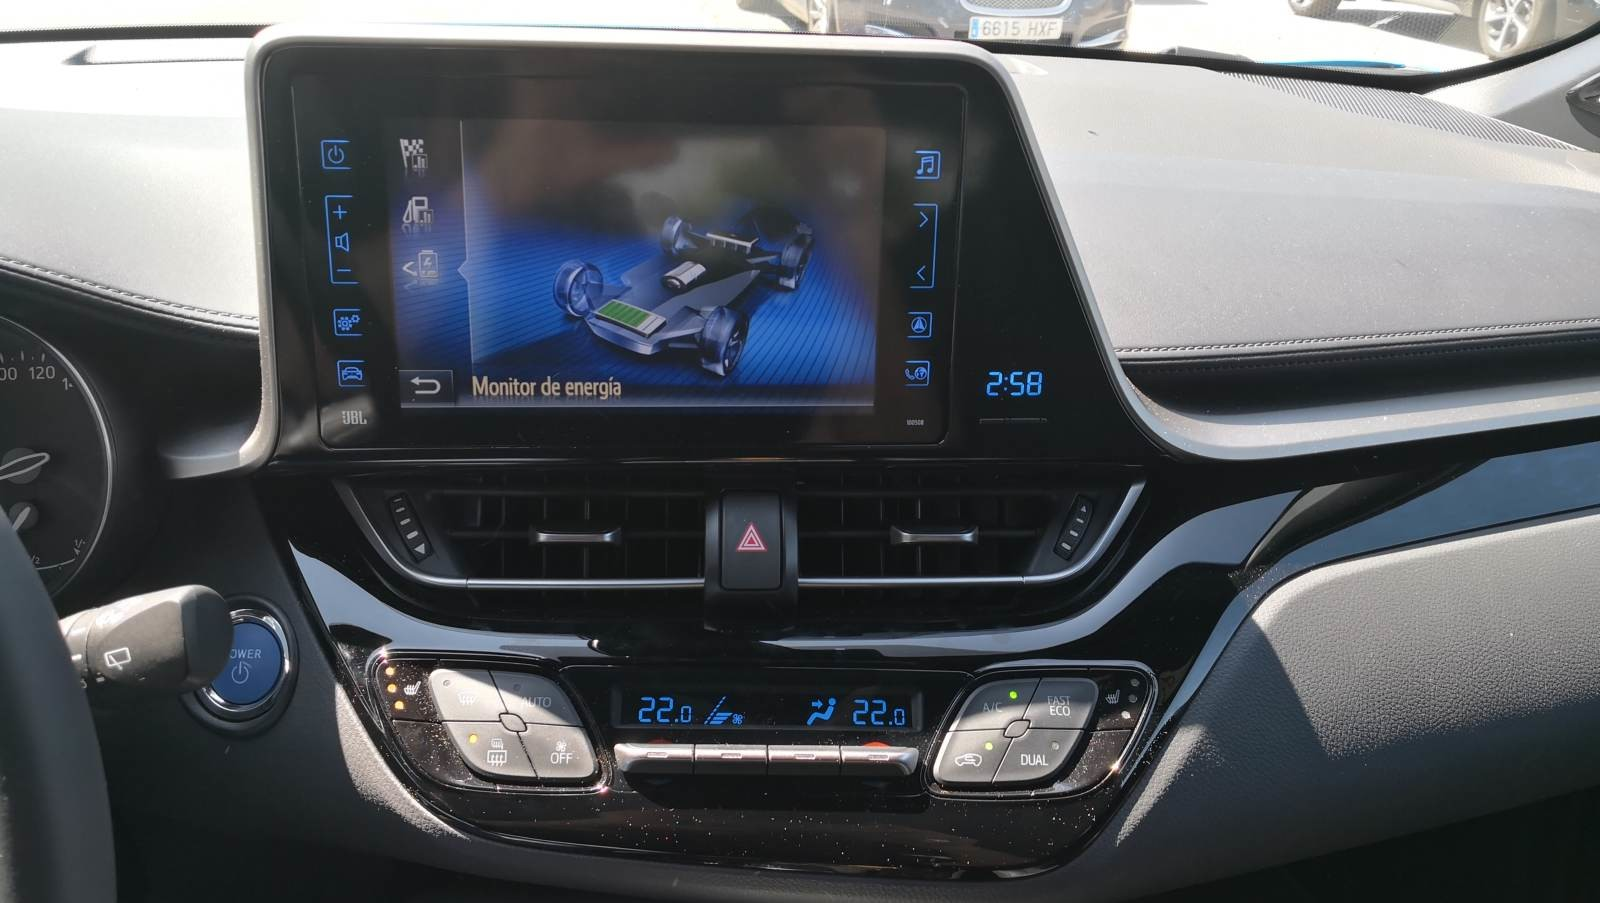 Foto de Toyota C-HR Dynamic Plus - Fotos interiores y detalles (7/15)